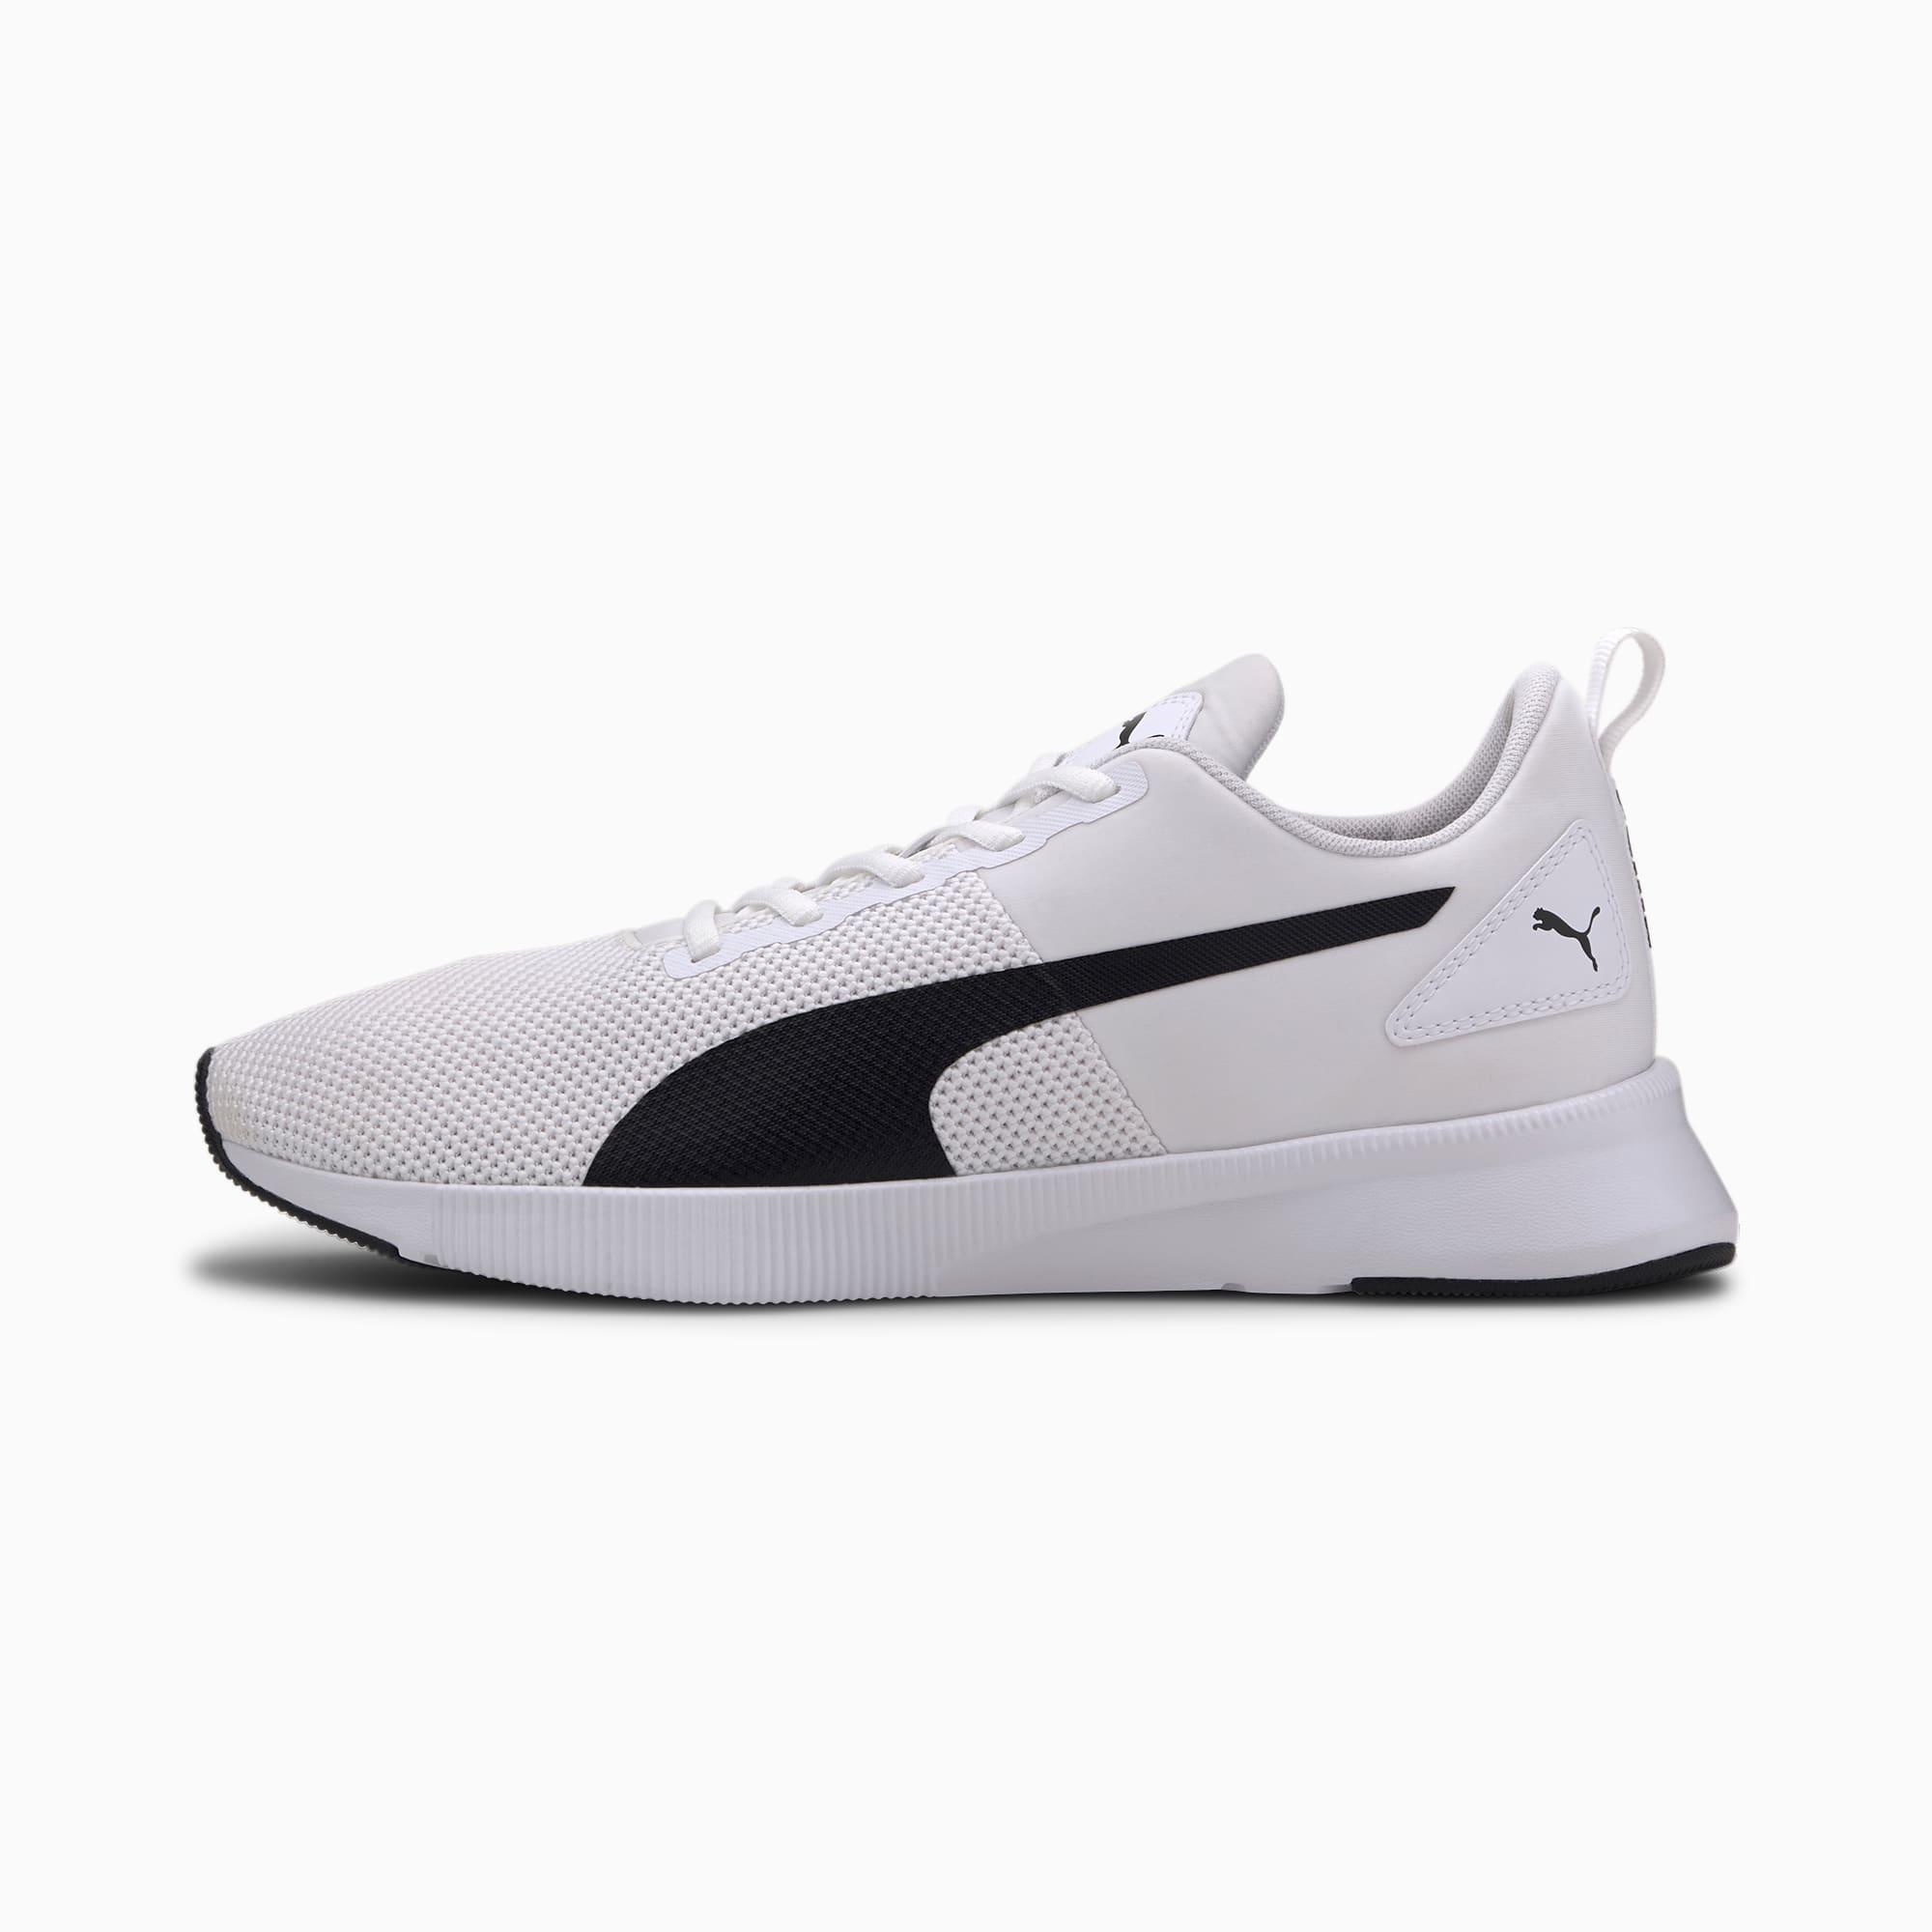 PUMA Chaussure de course Flyer Runner, Blanc/Noir, Taille 41, Chaussures